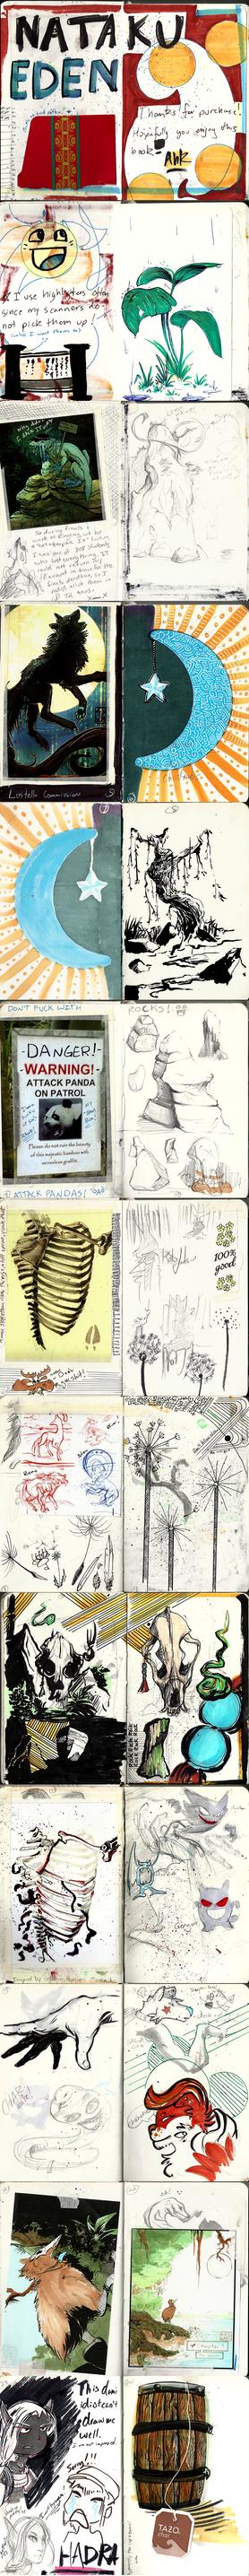 Sketchbook COM: NatakuXeden 01-24 by Ahkward